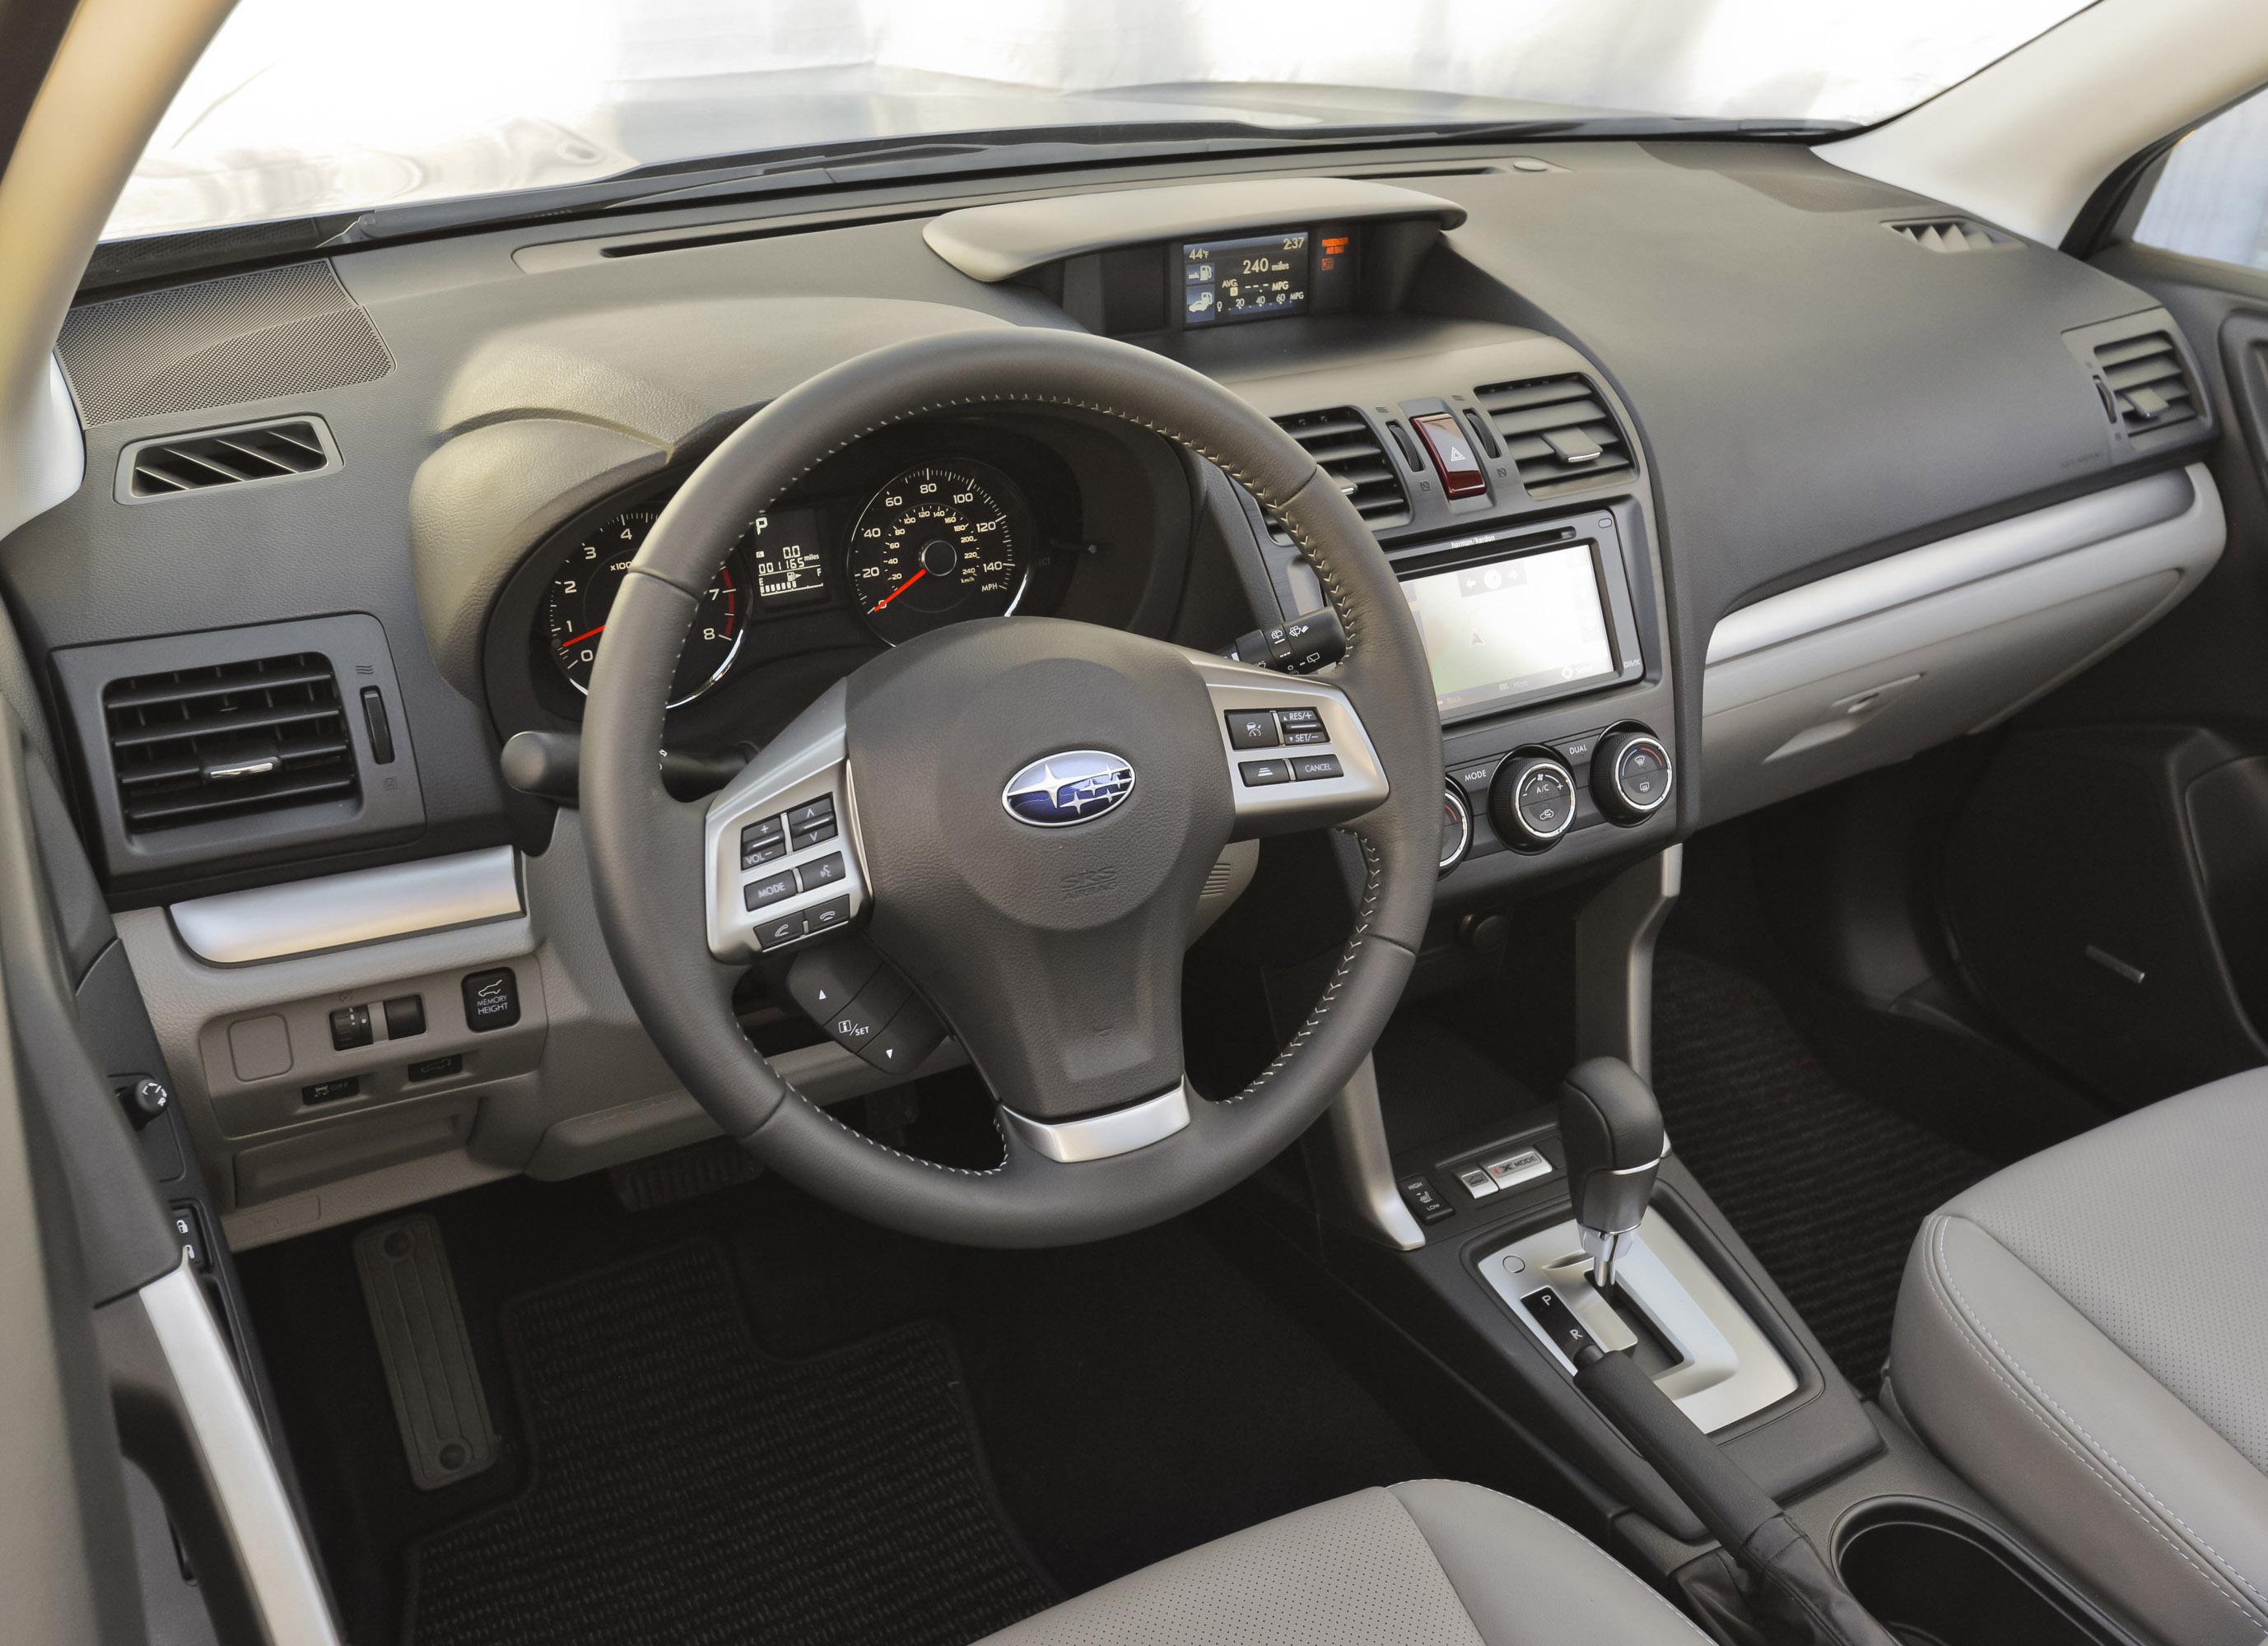 2014 Subaru Forester первого автомобиля до туза безопасности IIHS тест [видео] - фотография №5